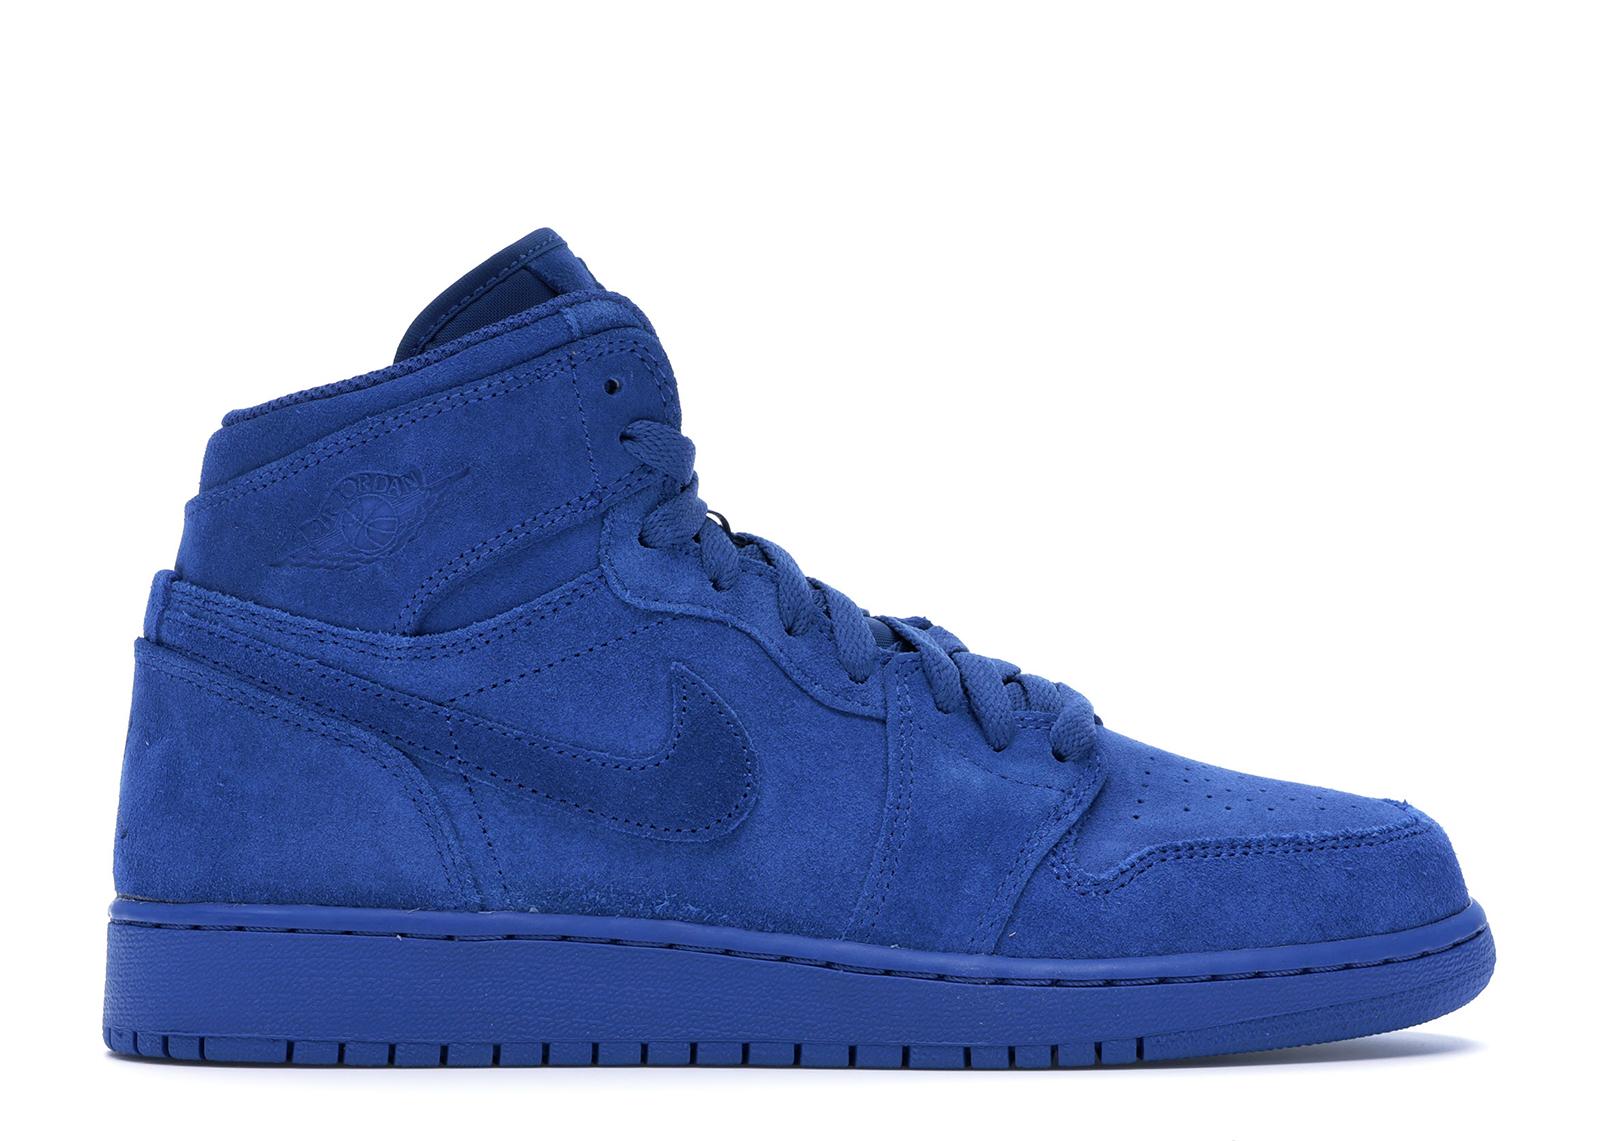 Jordan 1 Retro Blue Suede (GS) - 705300-404